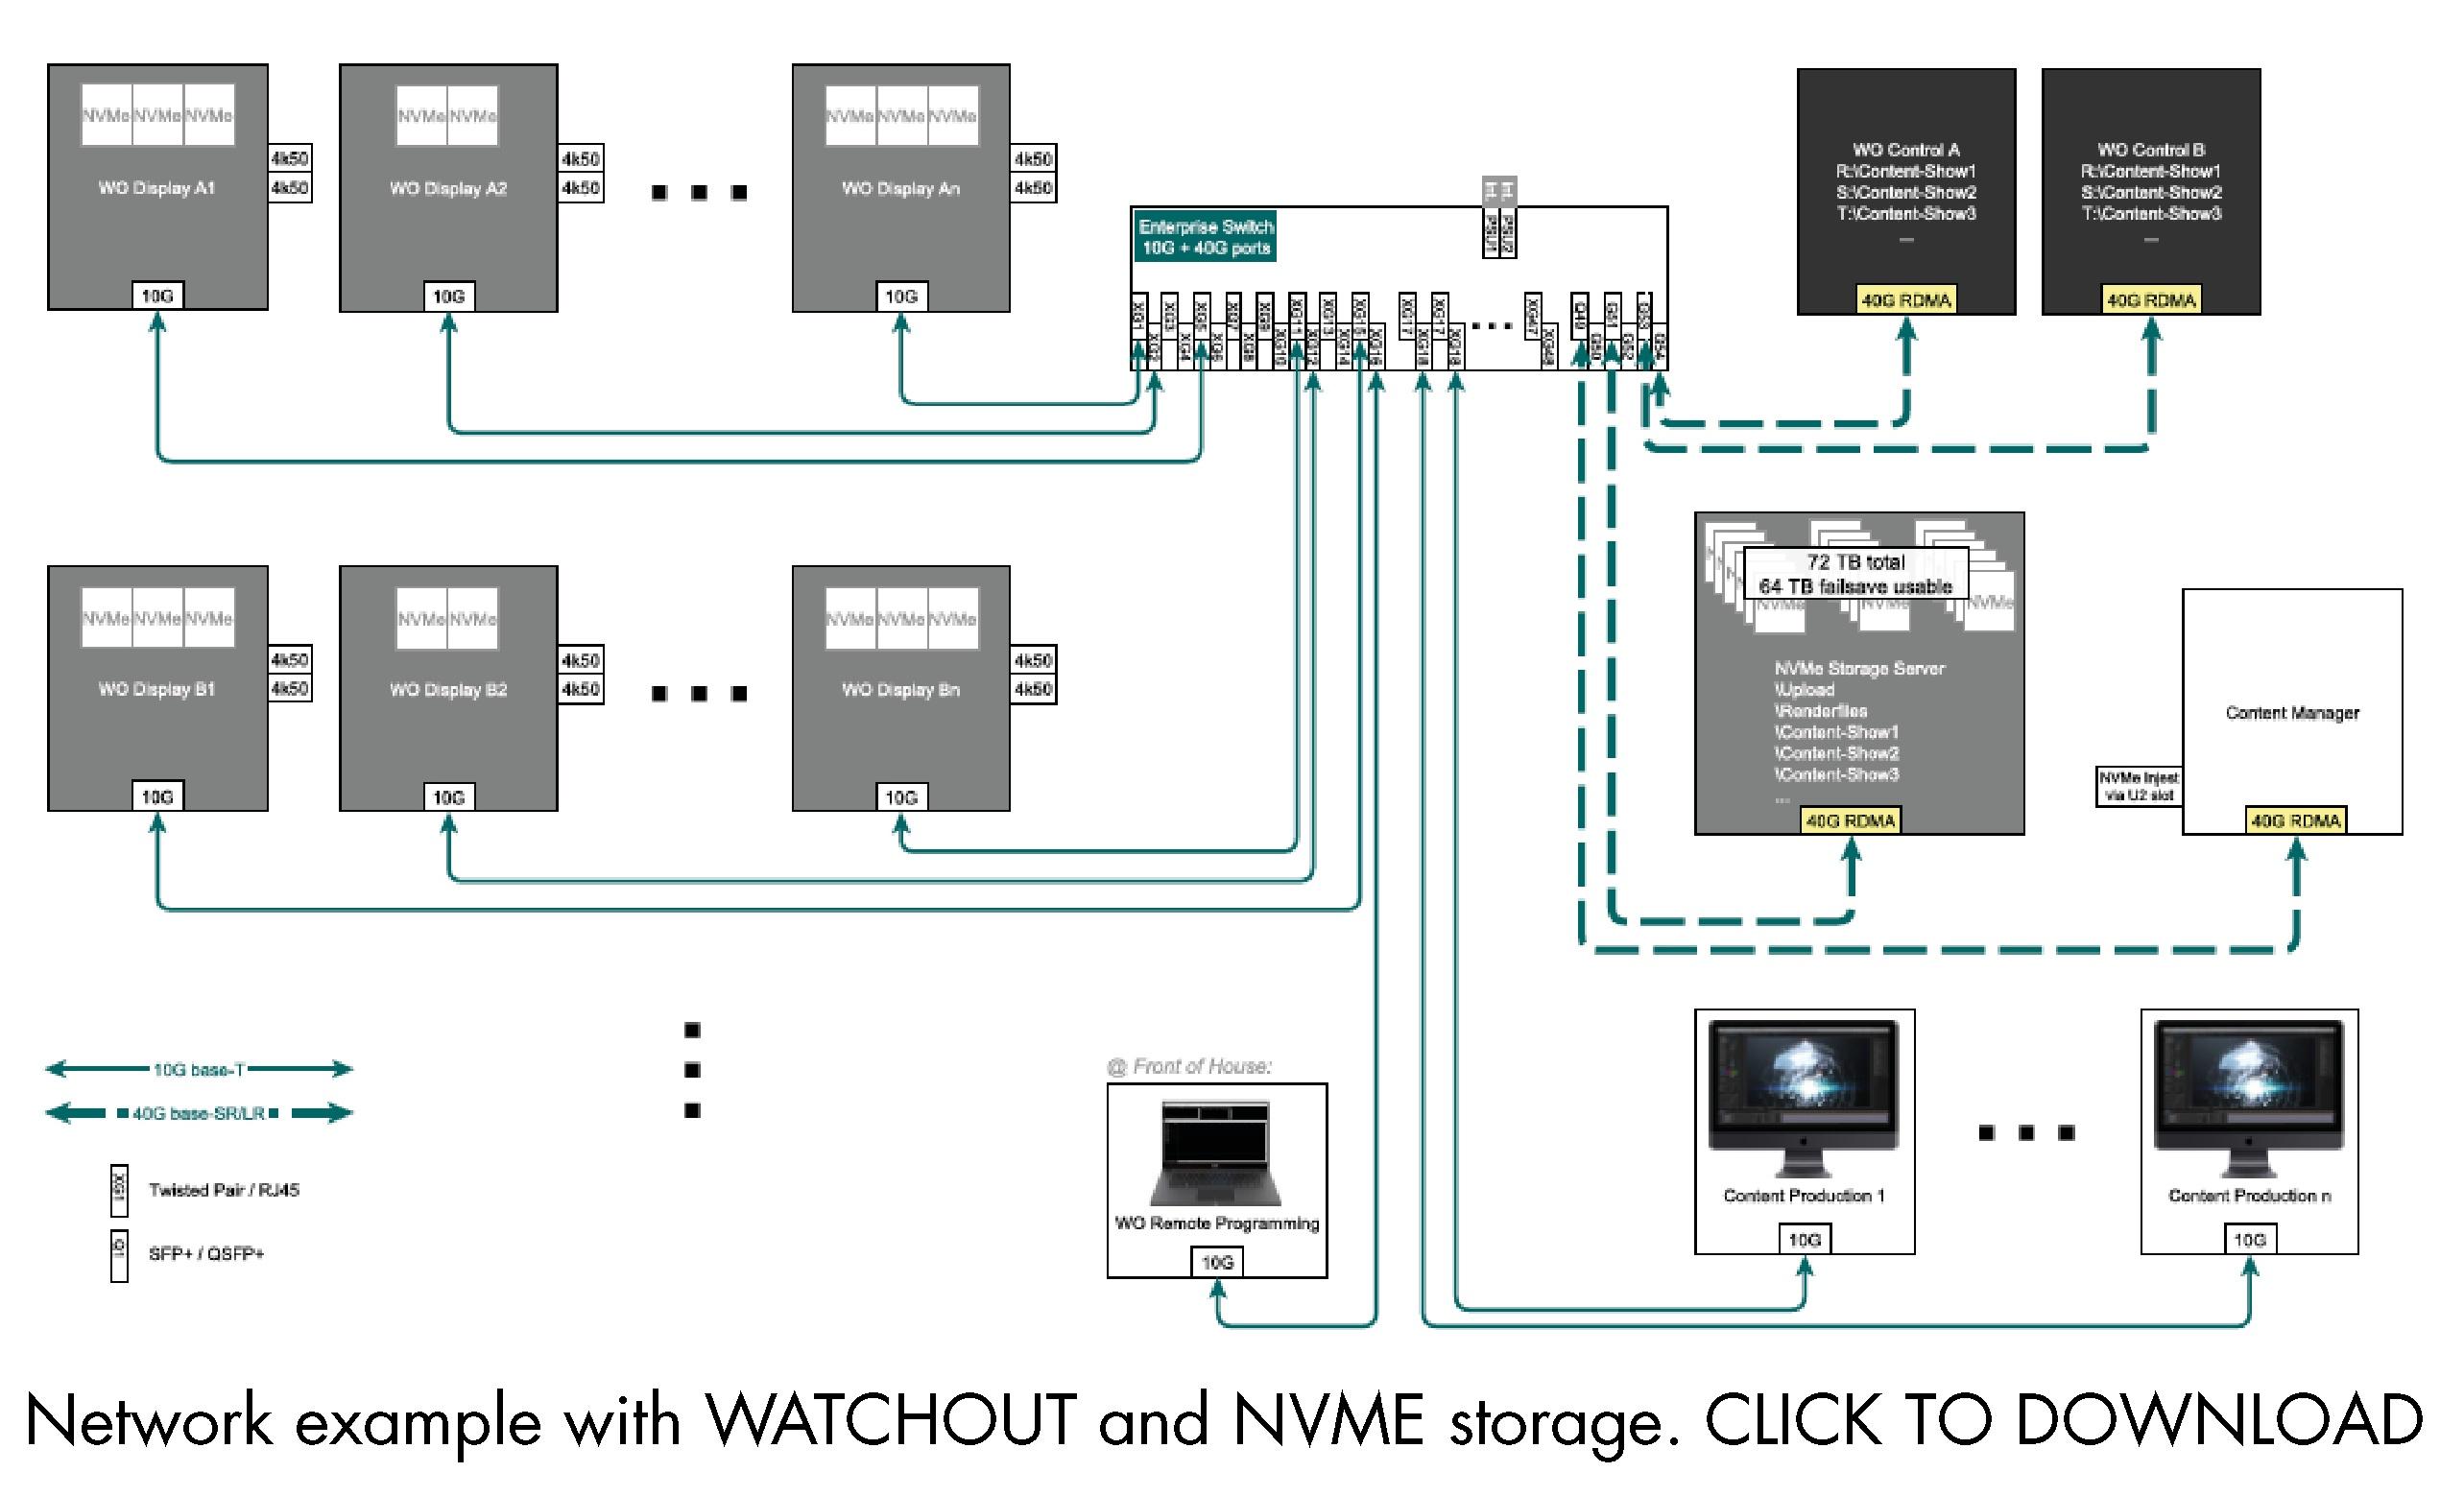 Network diagram link-1